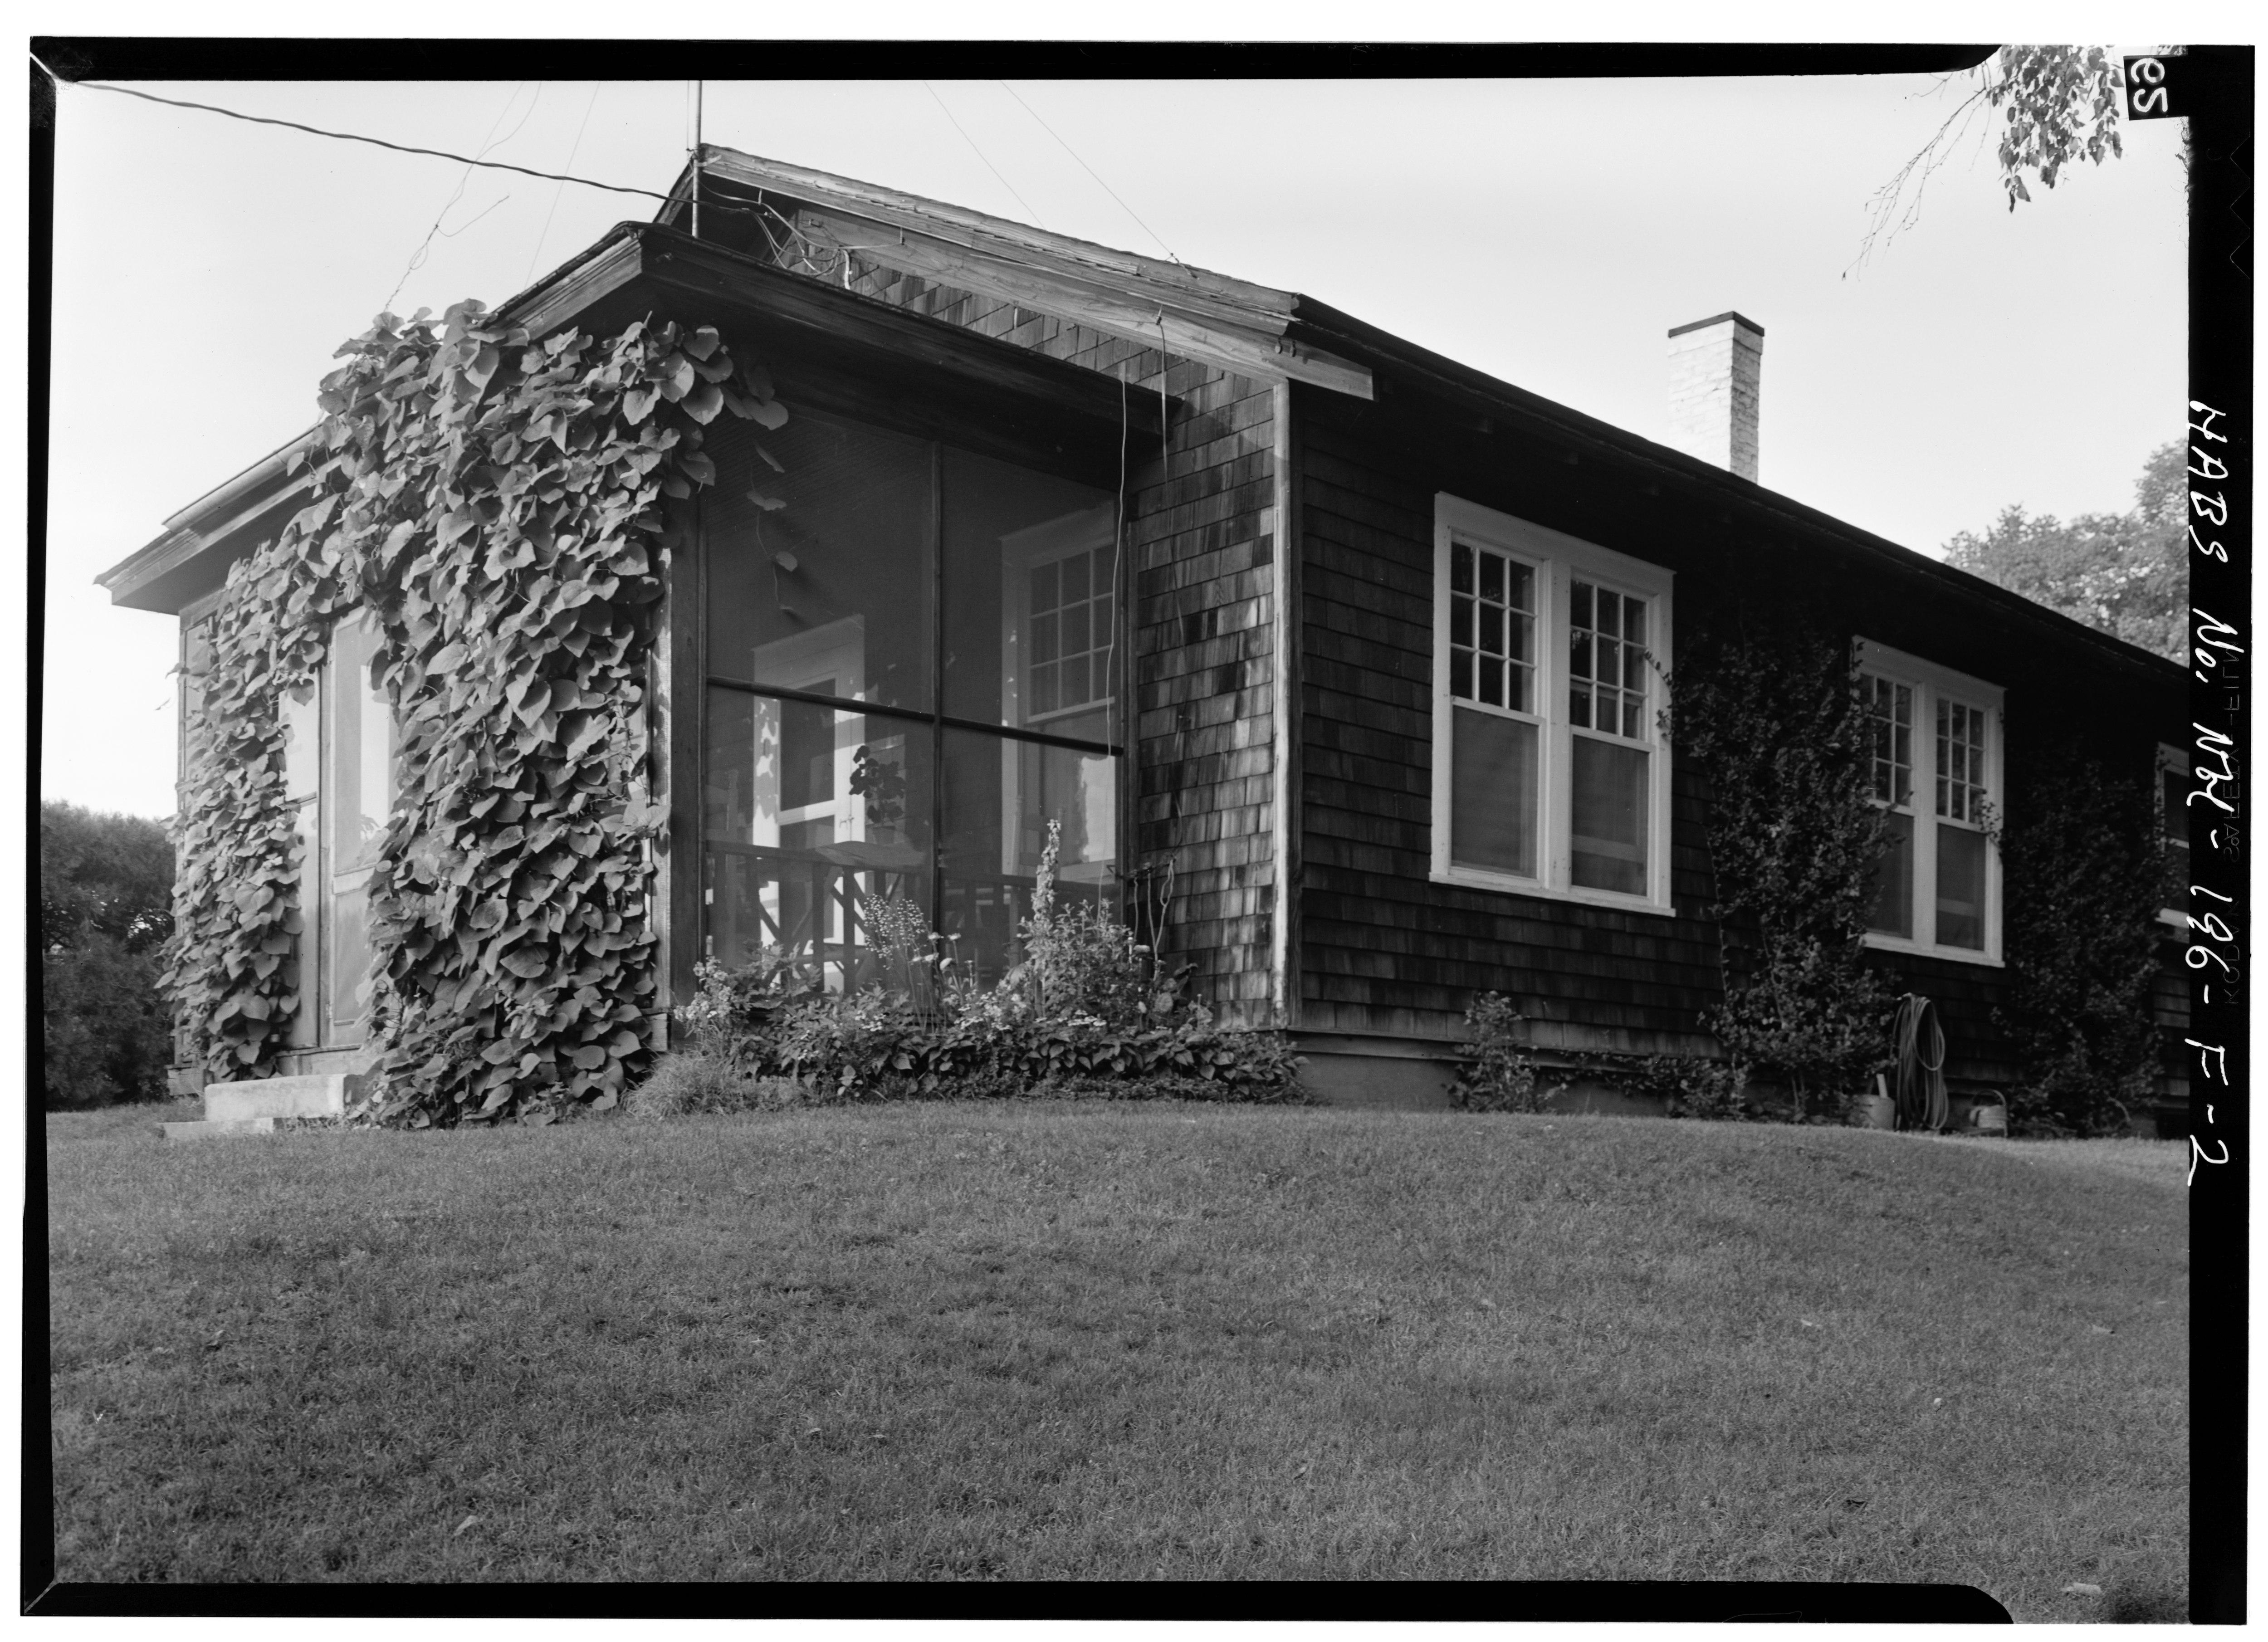 file exterior from southwest cottage augustus saint gaudens national historic site. Black Bedroom Furniture Sets. Home Design Ideas